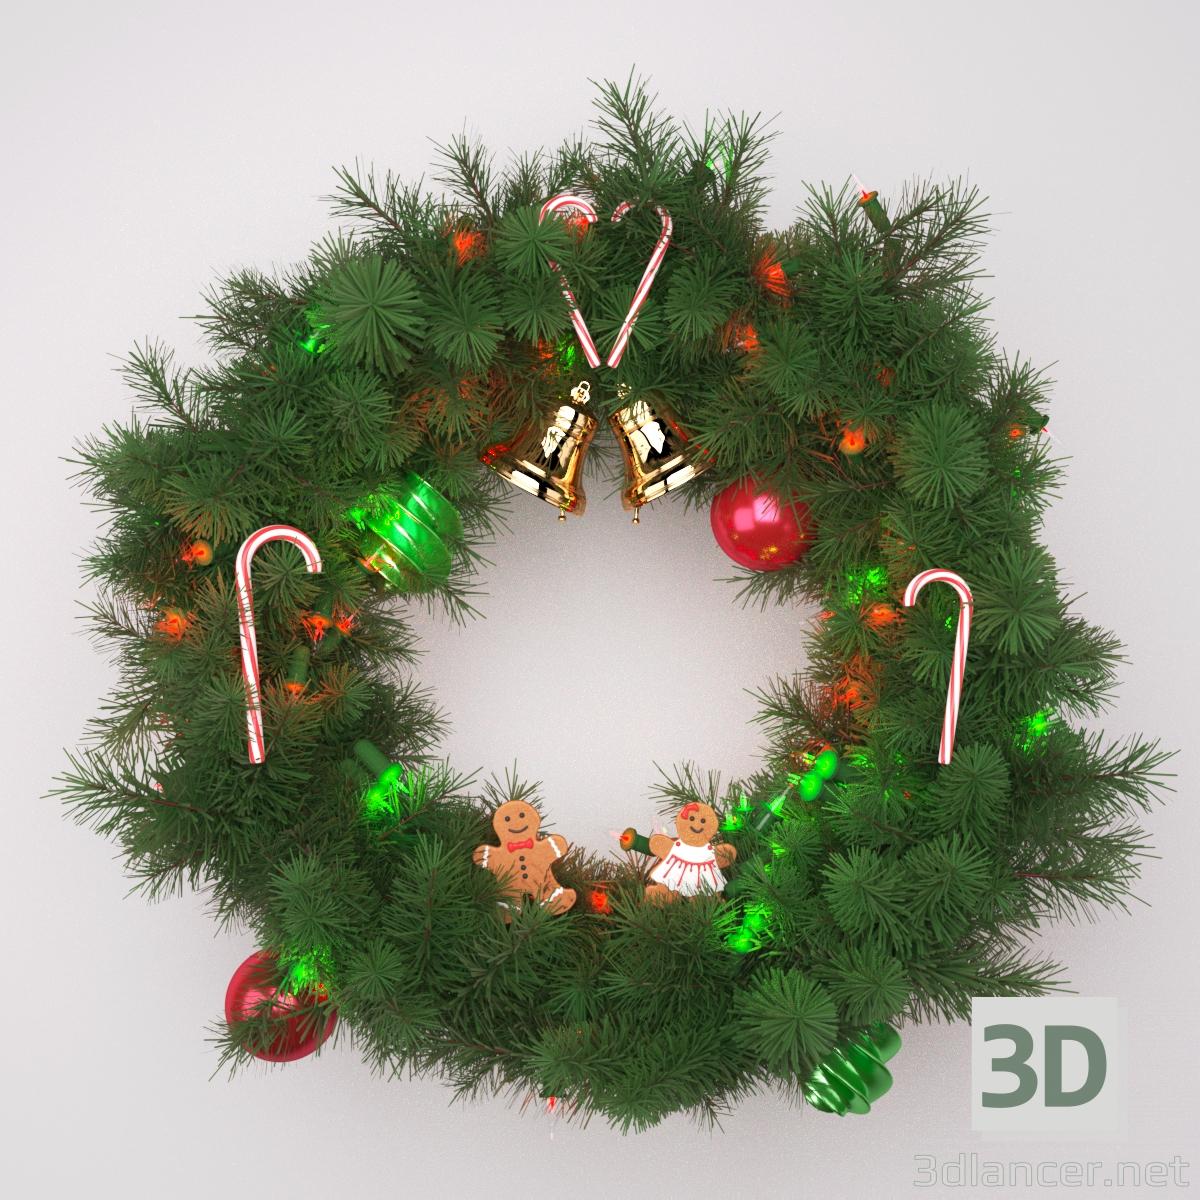 3 डी क्रिसमस पुष्पांजलि मॉडल खरीद - रेंडर